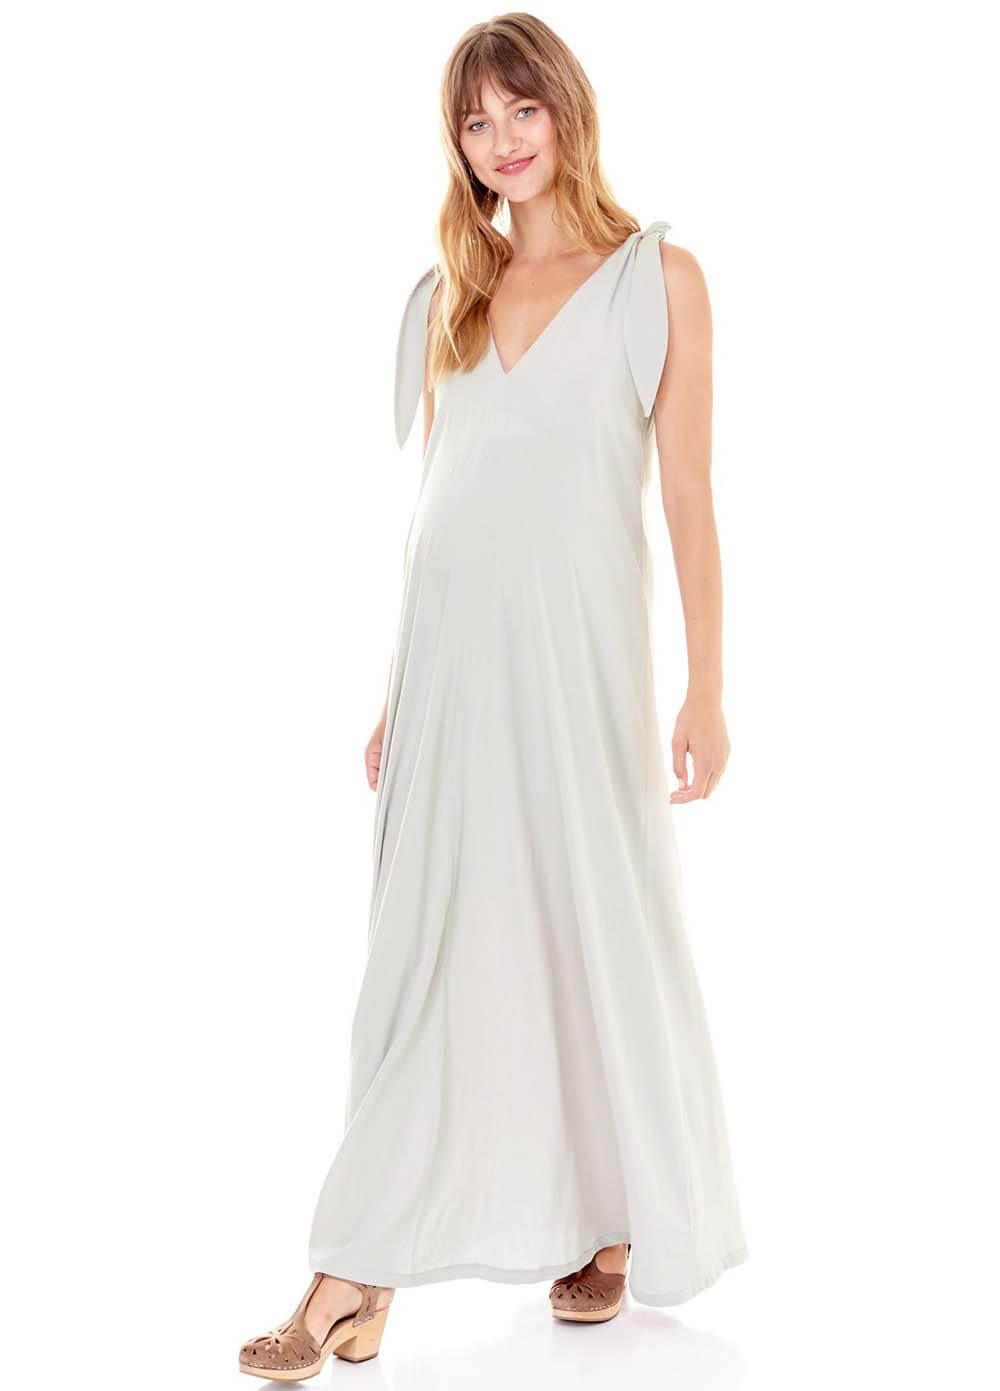 124204d8441e Jordan Maternity Maxi Dress in Grey by Imanimo